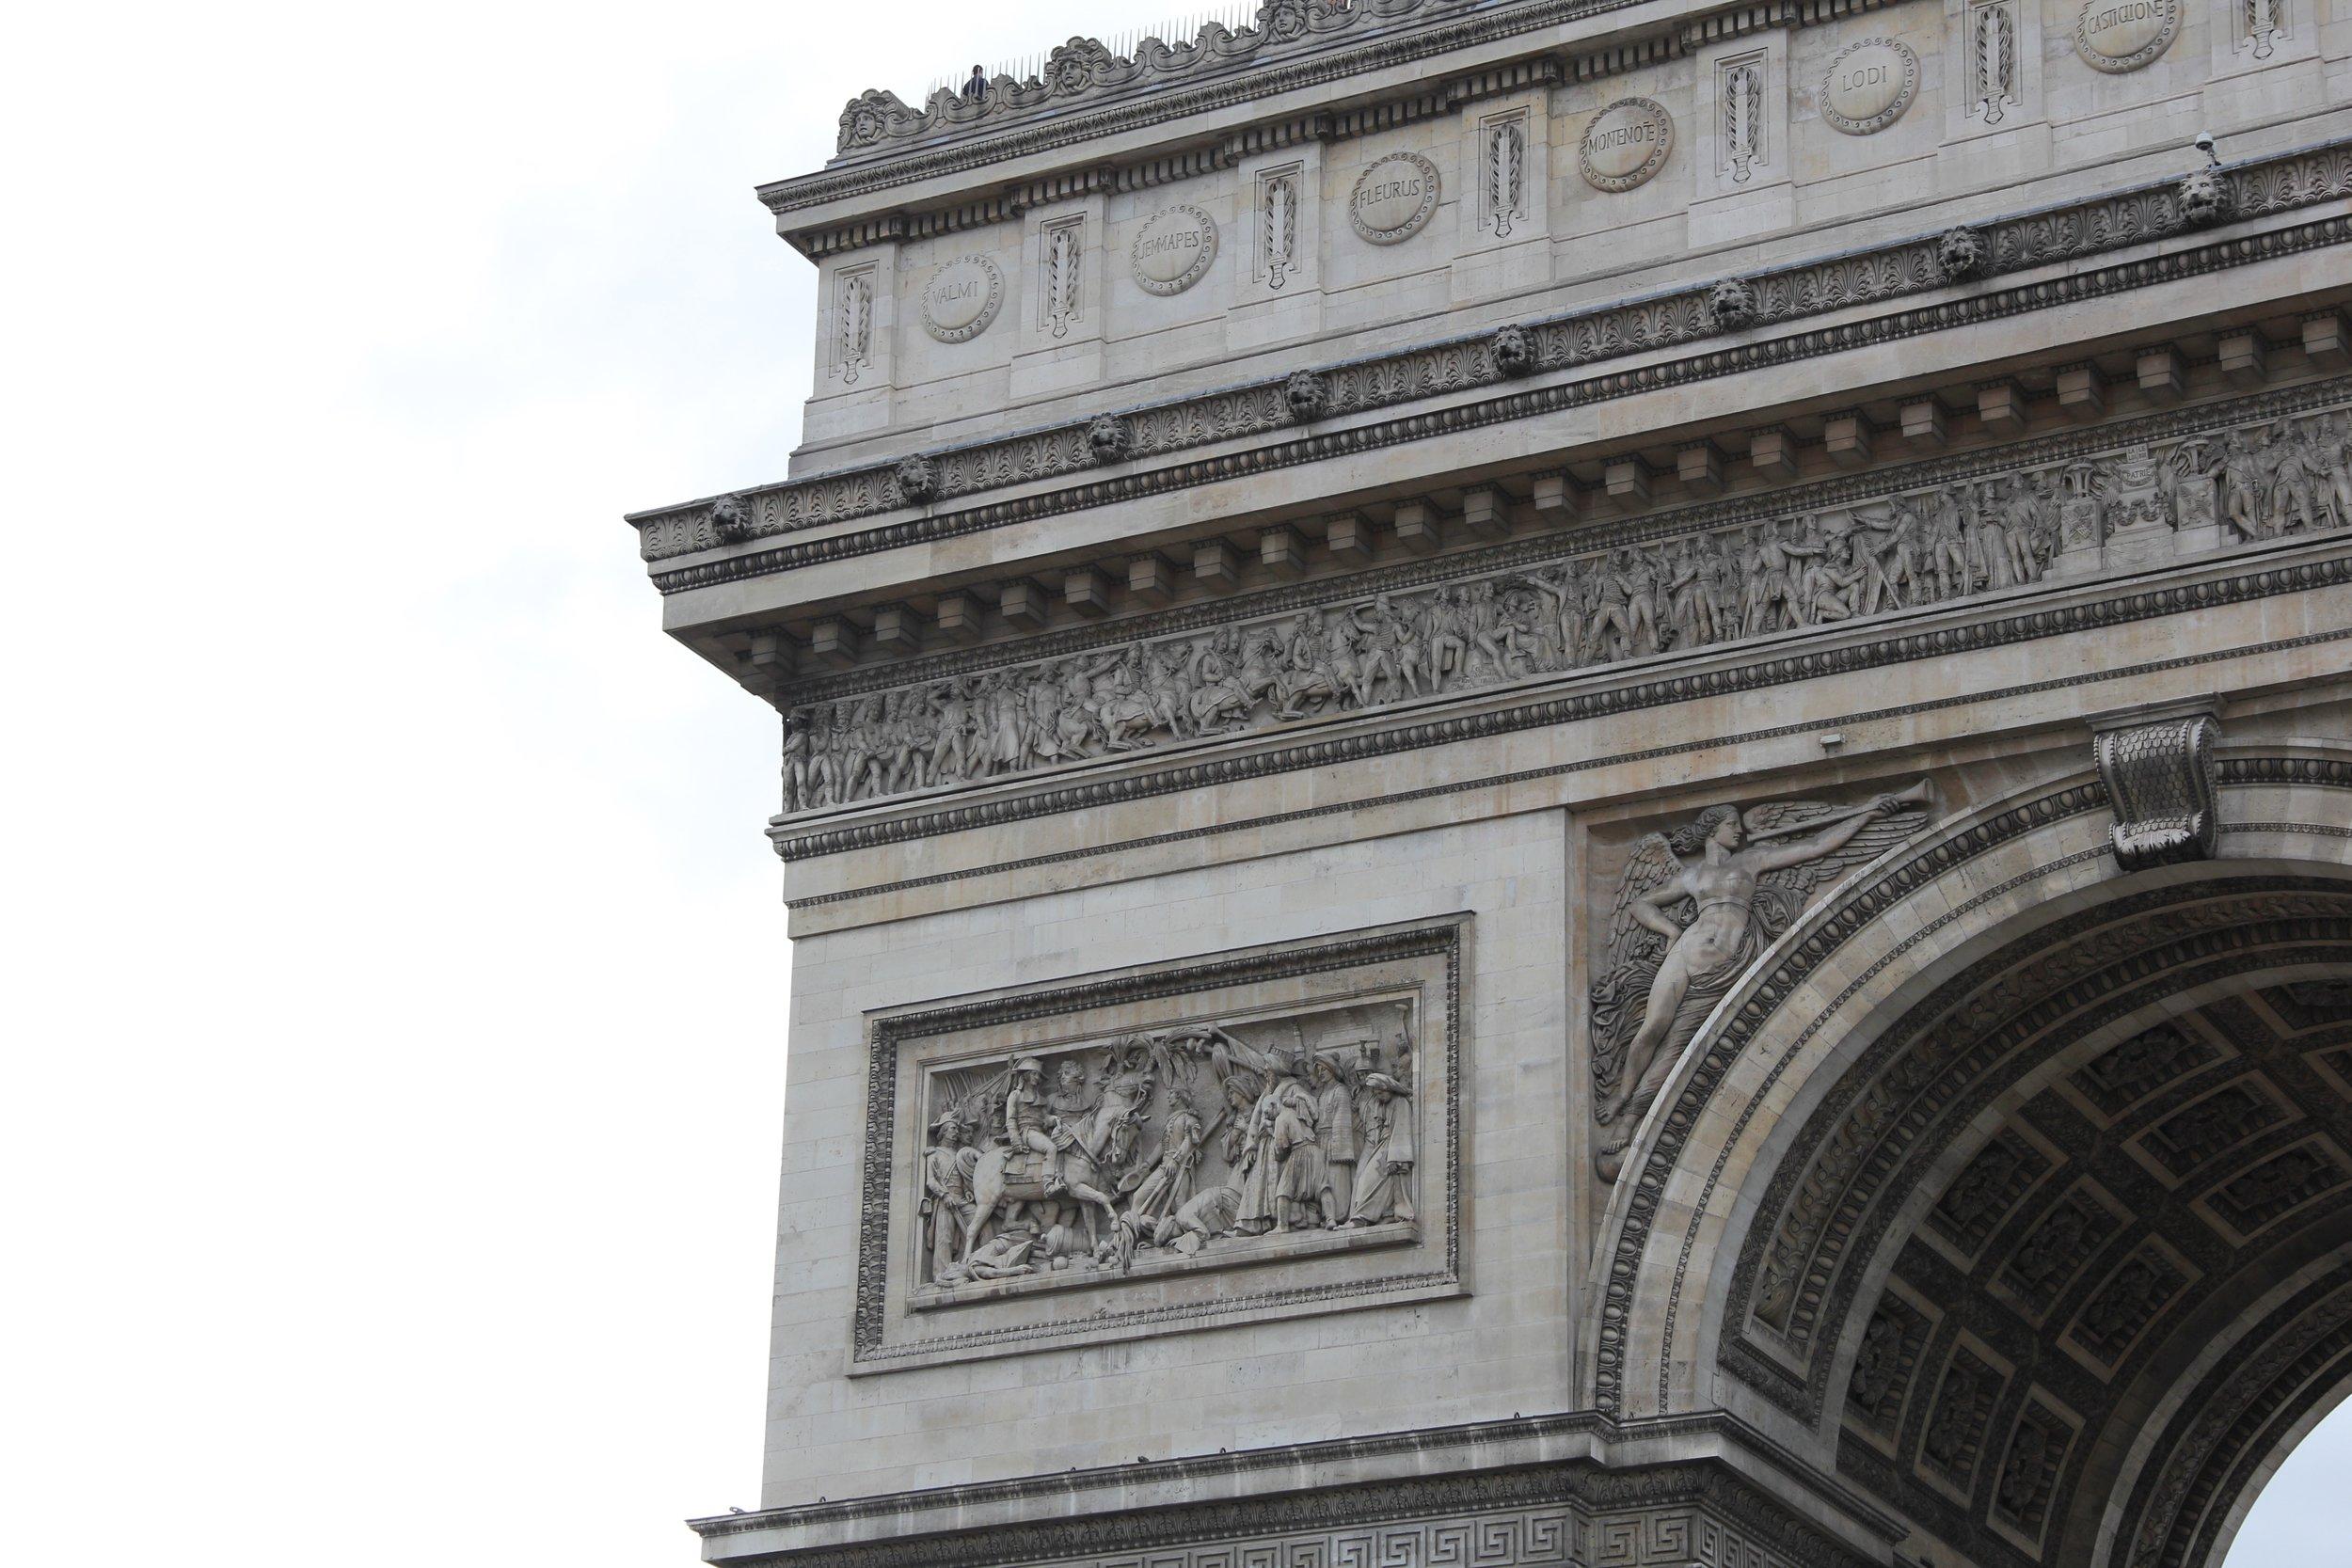 2016.09 Paris Edited 8429.jpg